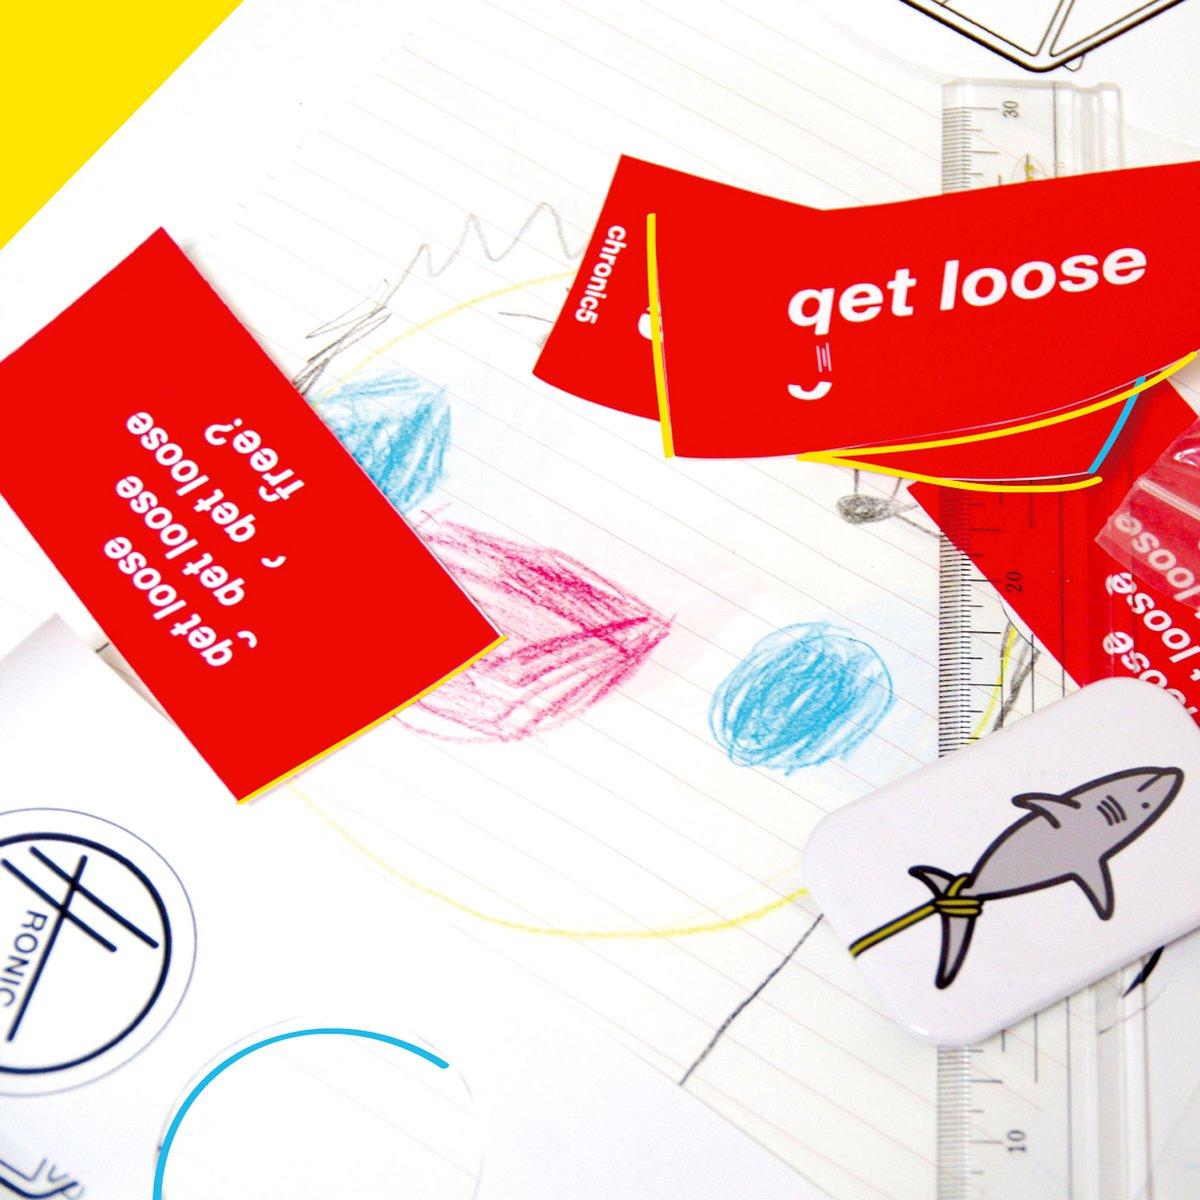 chronic5iew  by chronic5  http://www.chronic5.com  #graphicdesign #shark #artwork #getloose #minimalist #lifeisswell #logodesigns #グラフィックデザイン #タイポグラフィ #アートワーク #ロゴ #ロゴデザイン #サメグッズ #baseecpic.twitter.com/jXpRrBZVKq